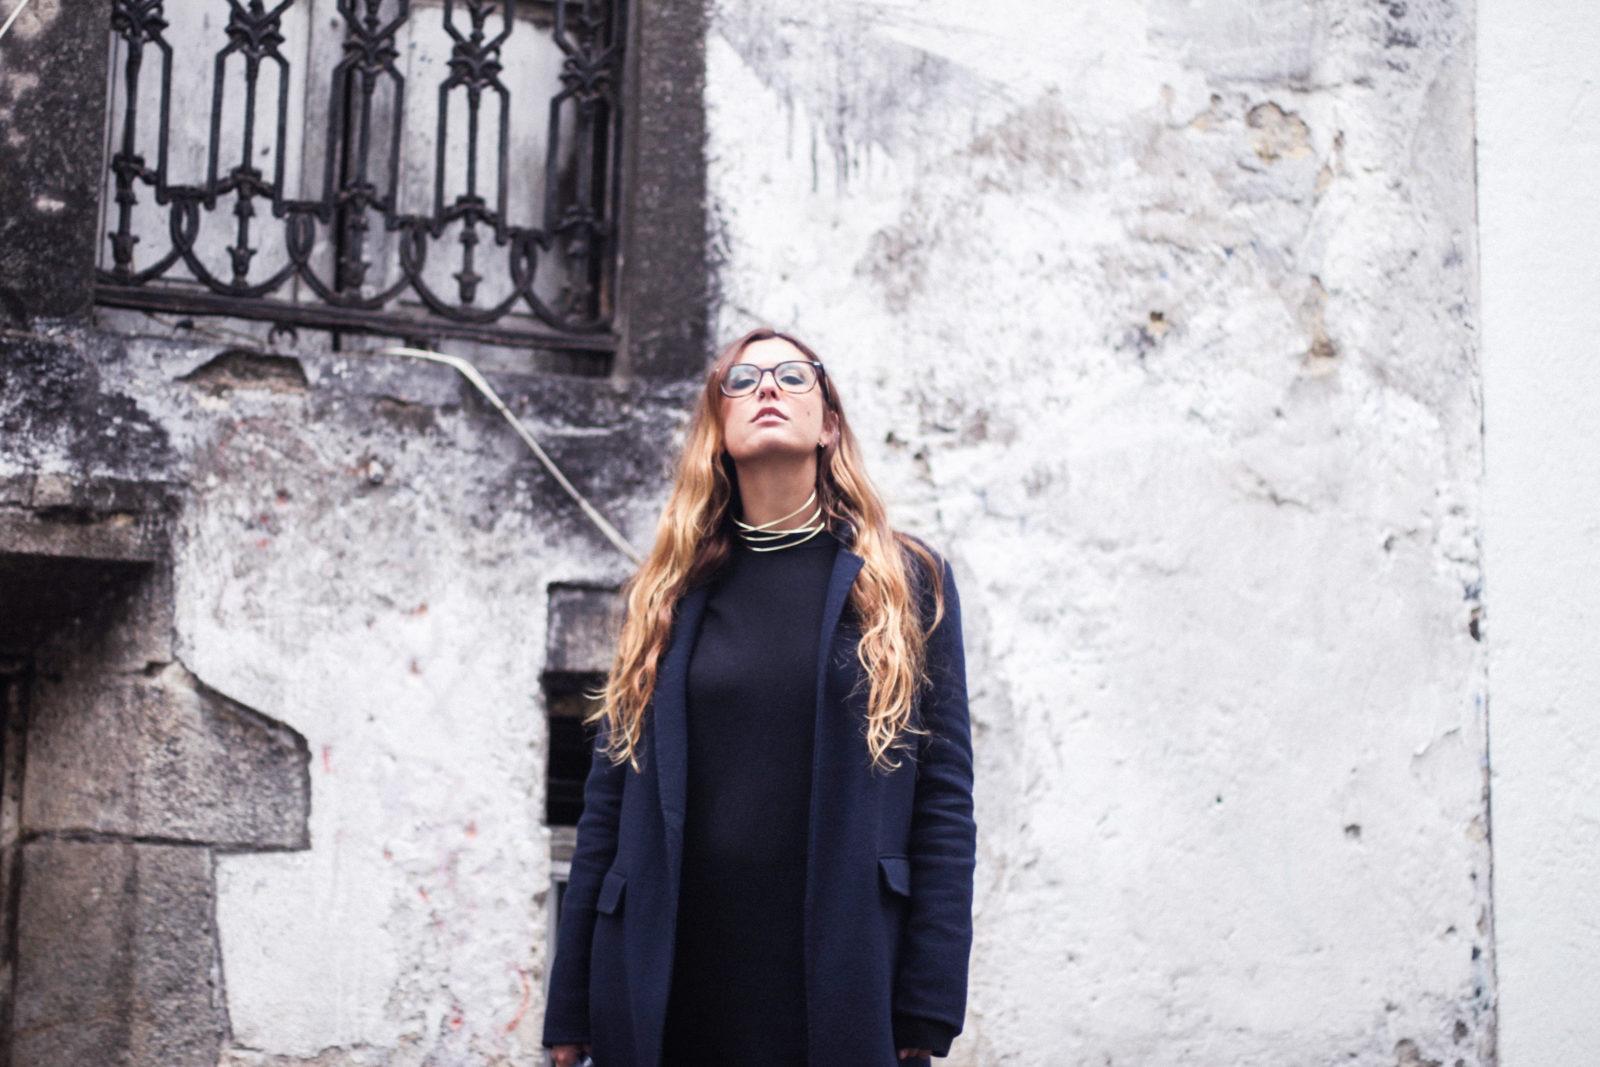 vestido_de_punto_midi_vans_calcetines_rejilla_choker_metalico_happiness_boutique_abrigo_largo_gucci_street_style_fall_2016_donkeycool-8